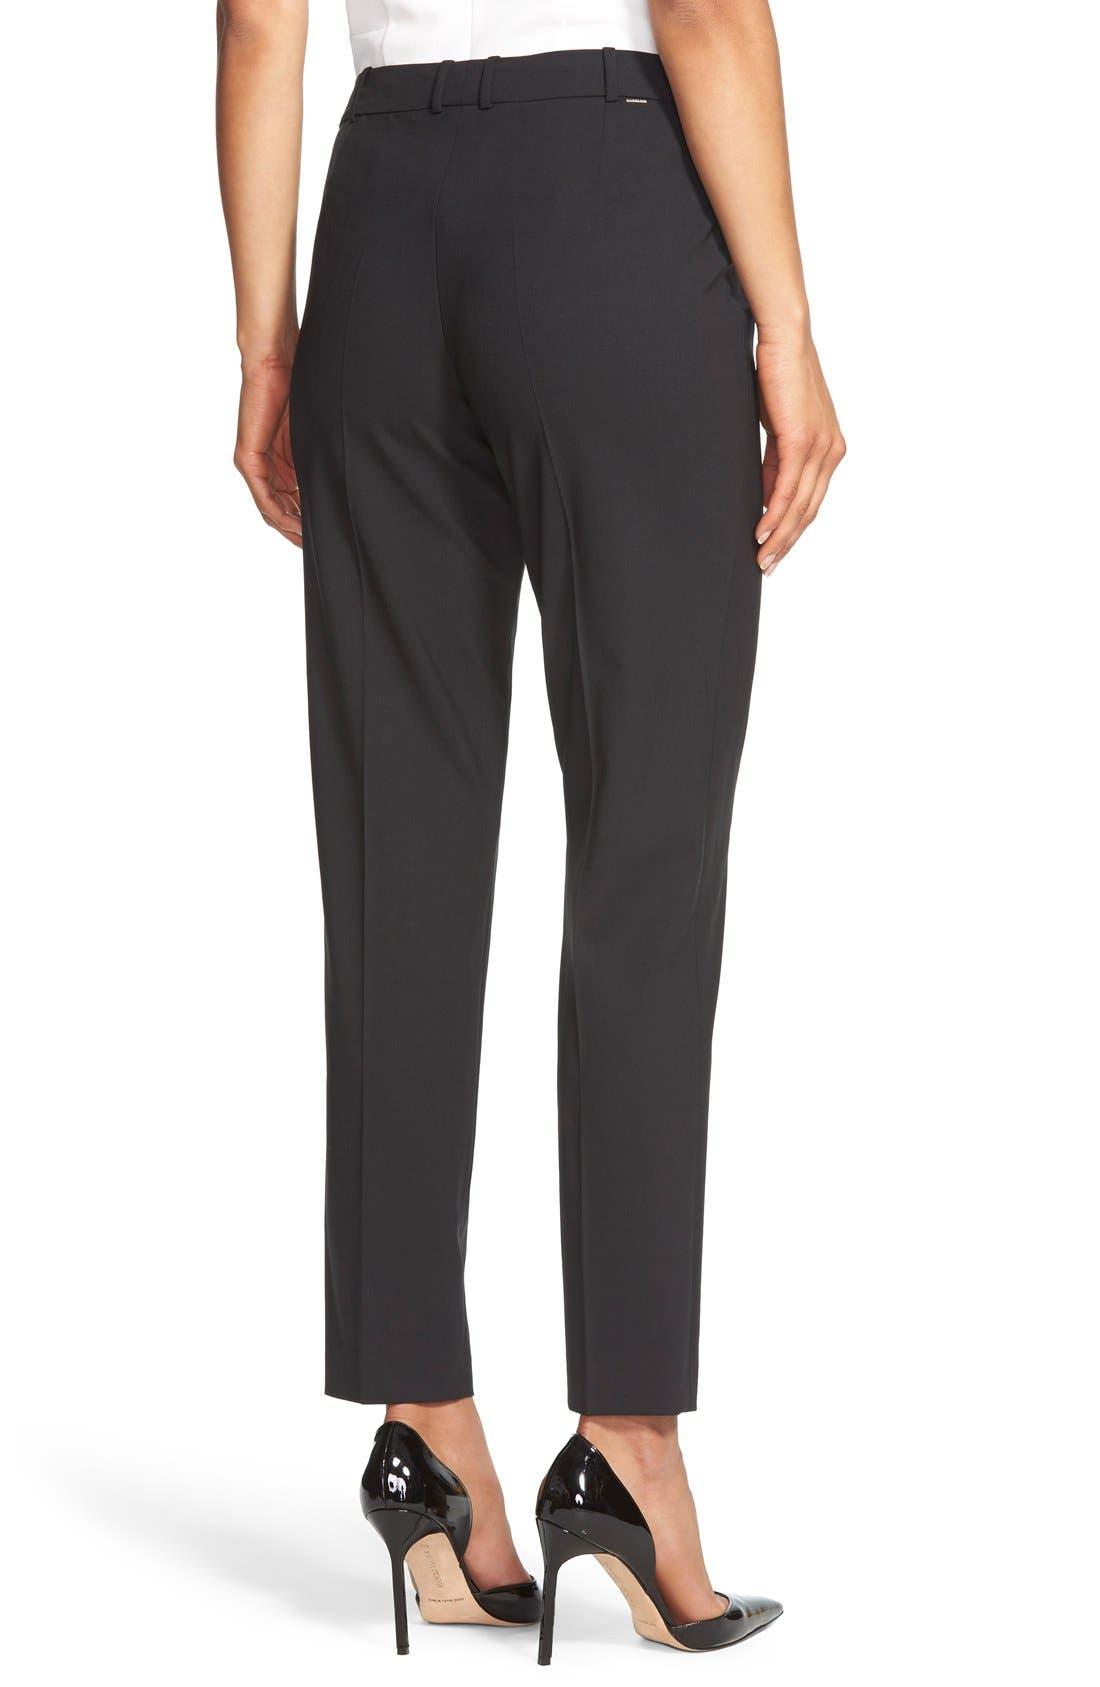 Tiluna Tropical Stretch Wool Ankle Trousers,                             Alternate thumbnail 3, color,                             BLACK